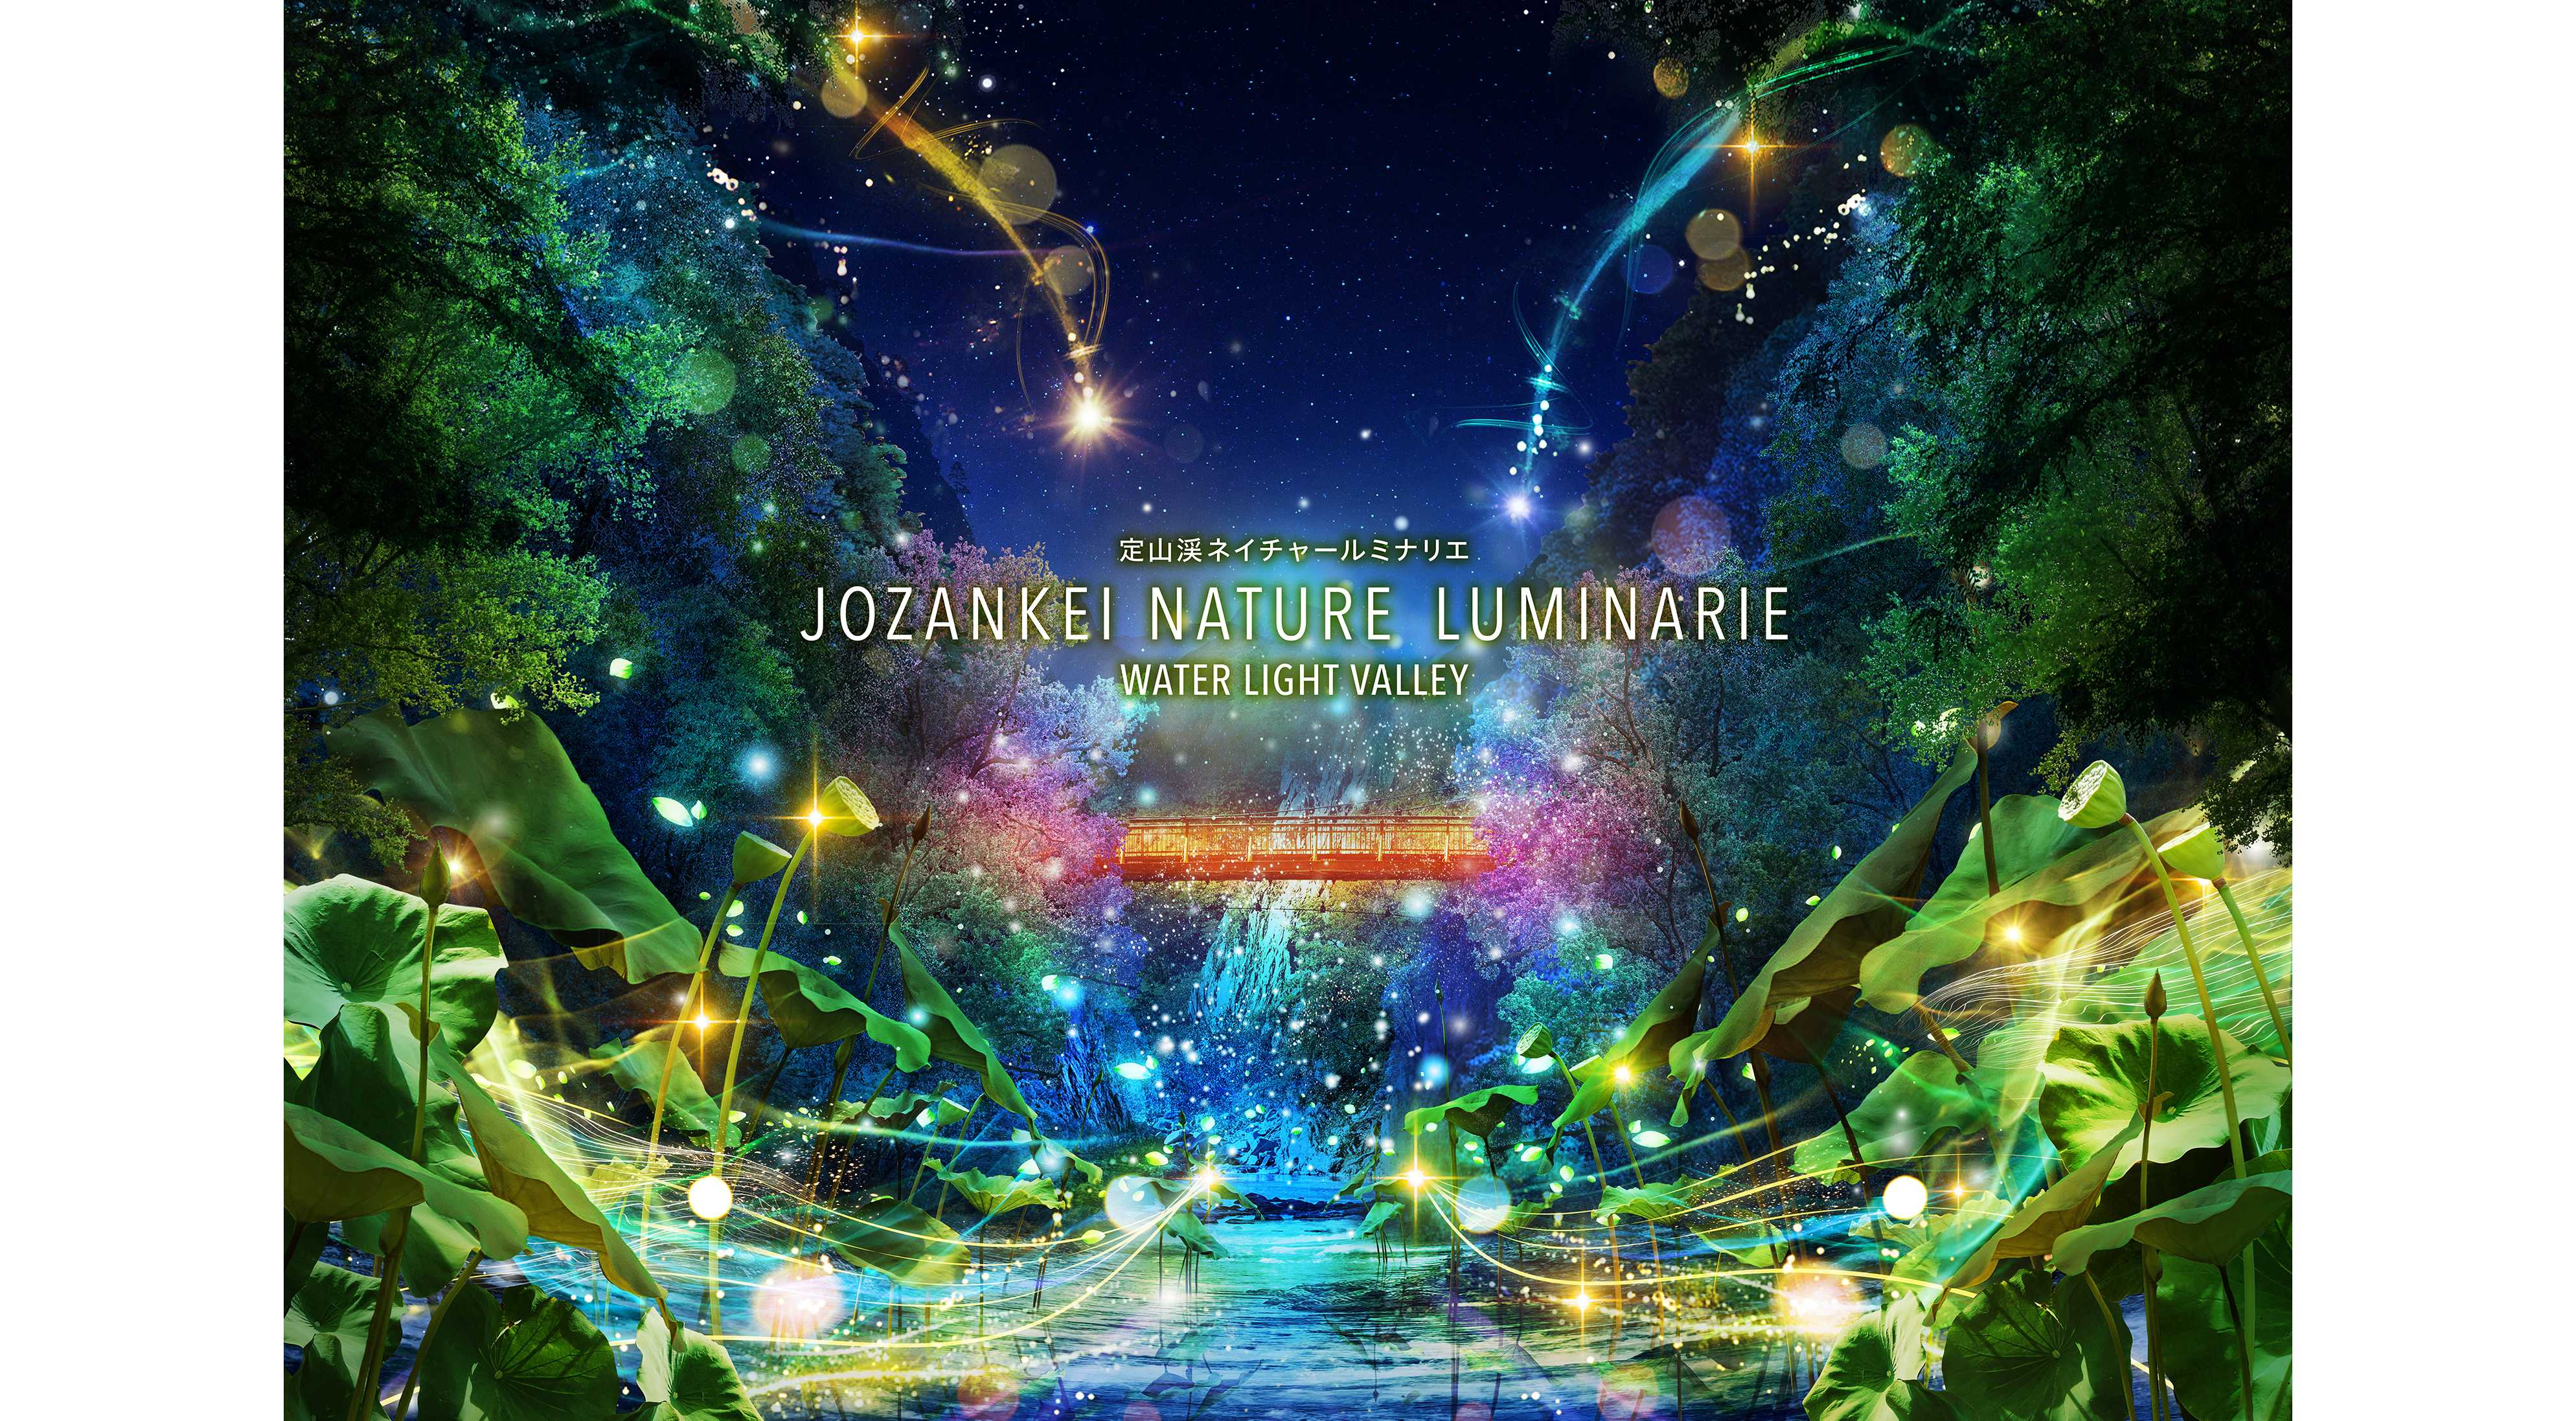 北海道・定山渓温泉で「JOZANKEI NATURE LUMINARIE」開催中1